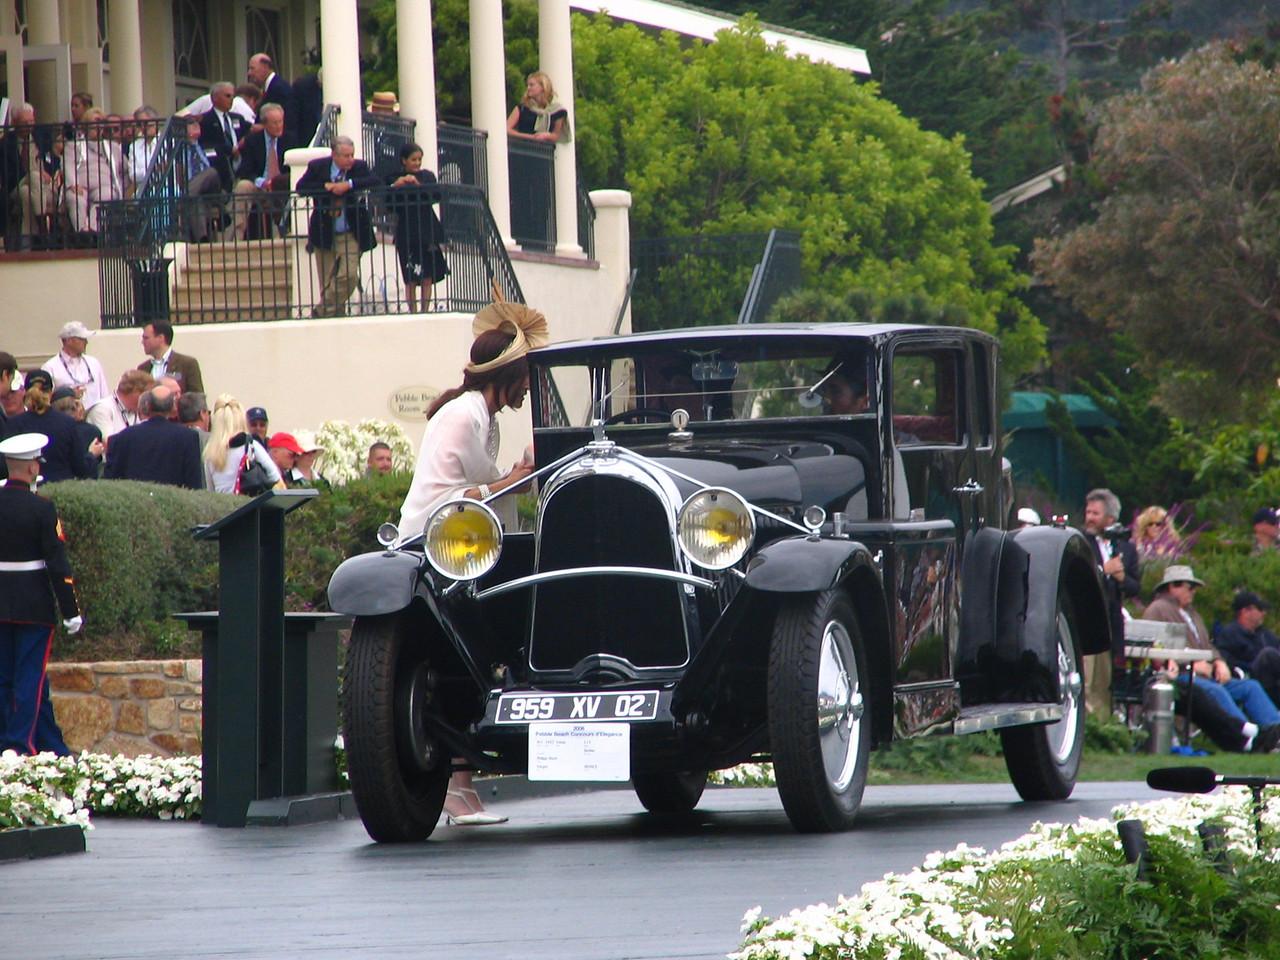 Class N-1, Voisin Early 1927-1933, Winner -- 1932 Voisin C14 Berline